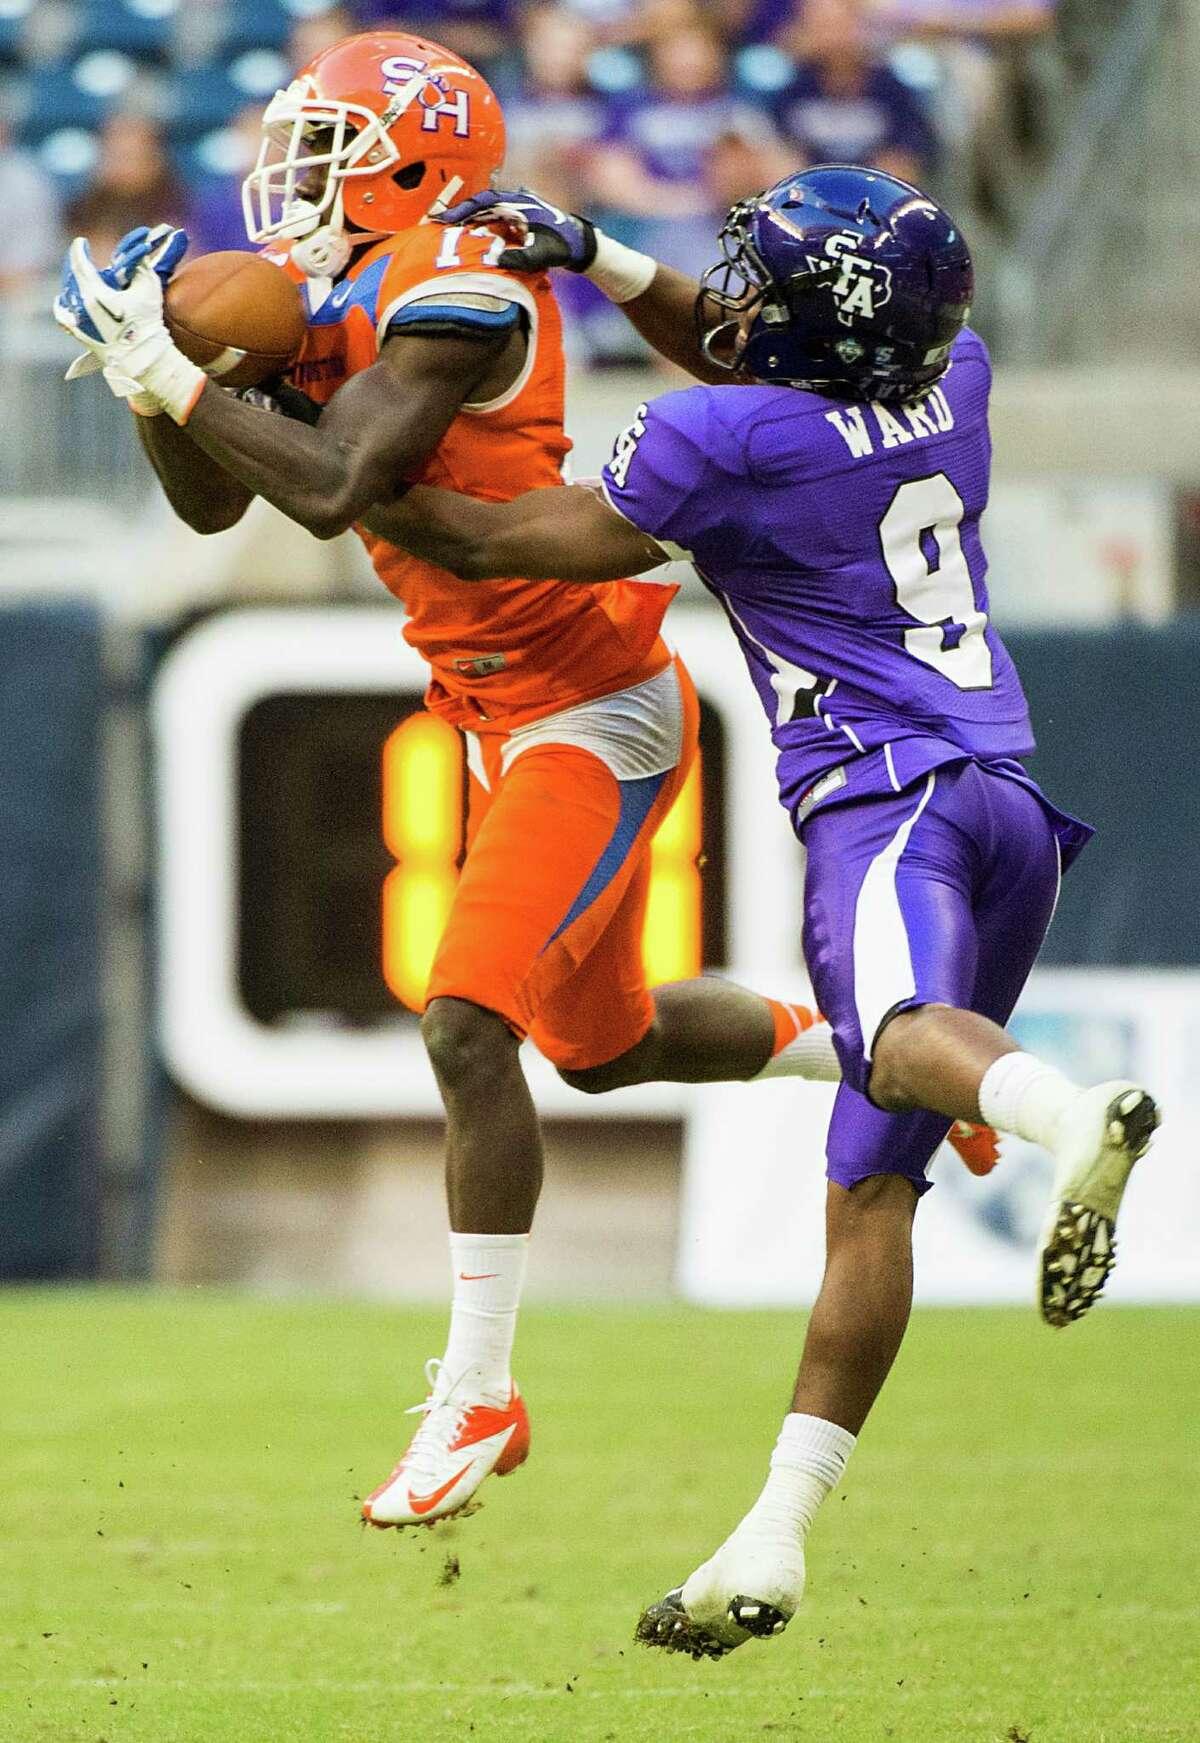 Sam Houston State cornerback Bookie Sneed intercepts a pass intended for Stephen F. Austin wide receiver DJ Ward.